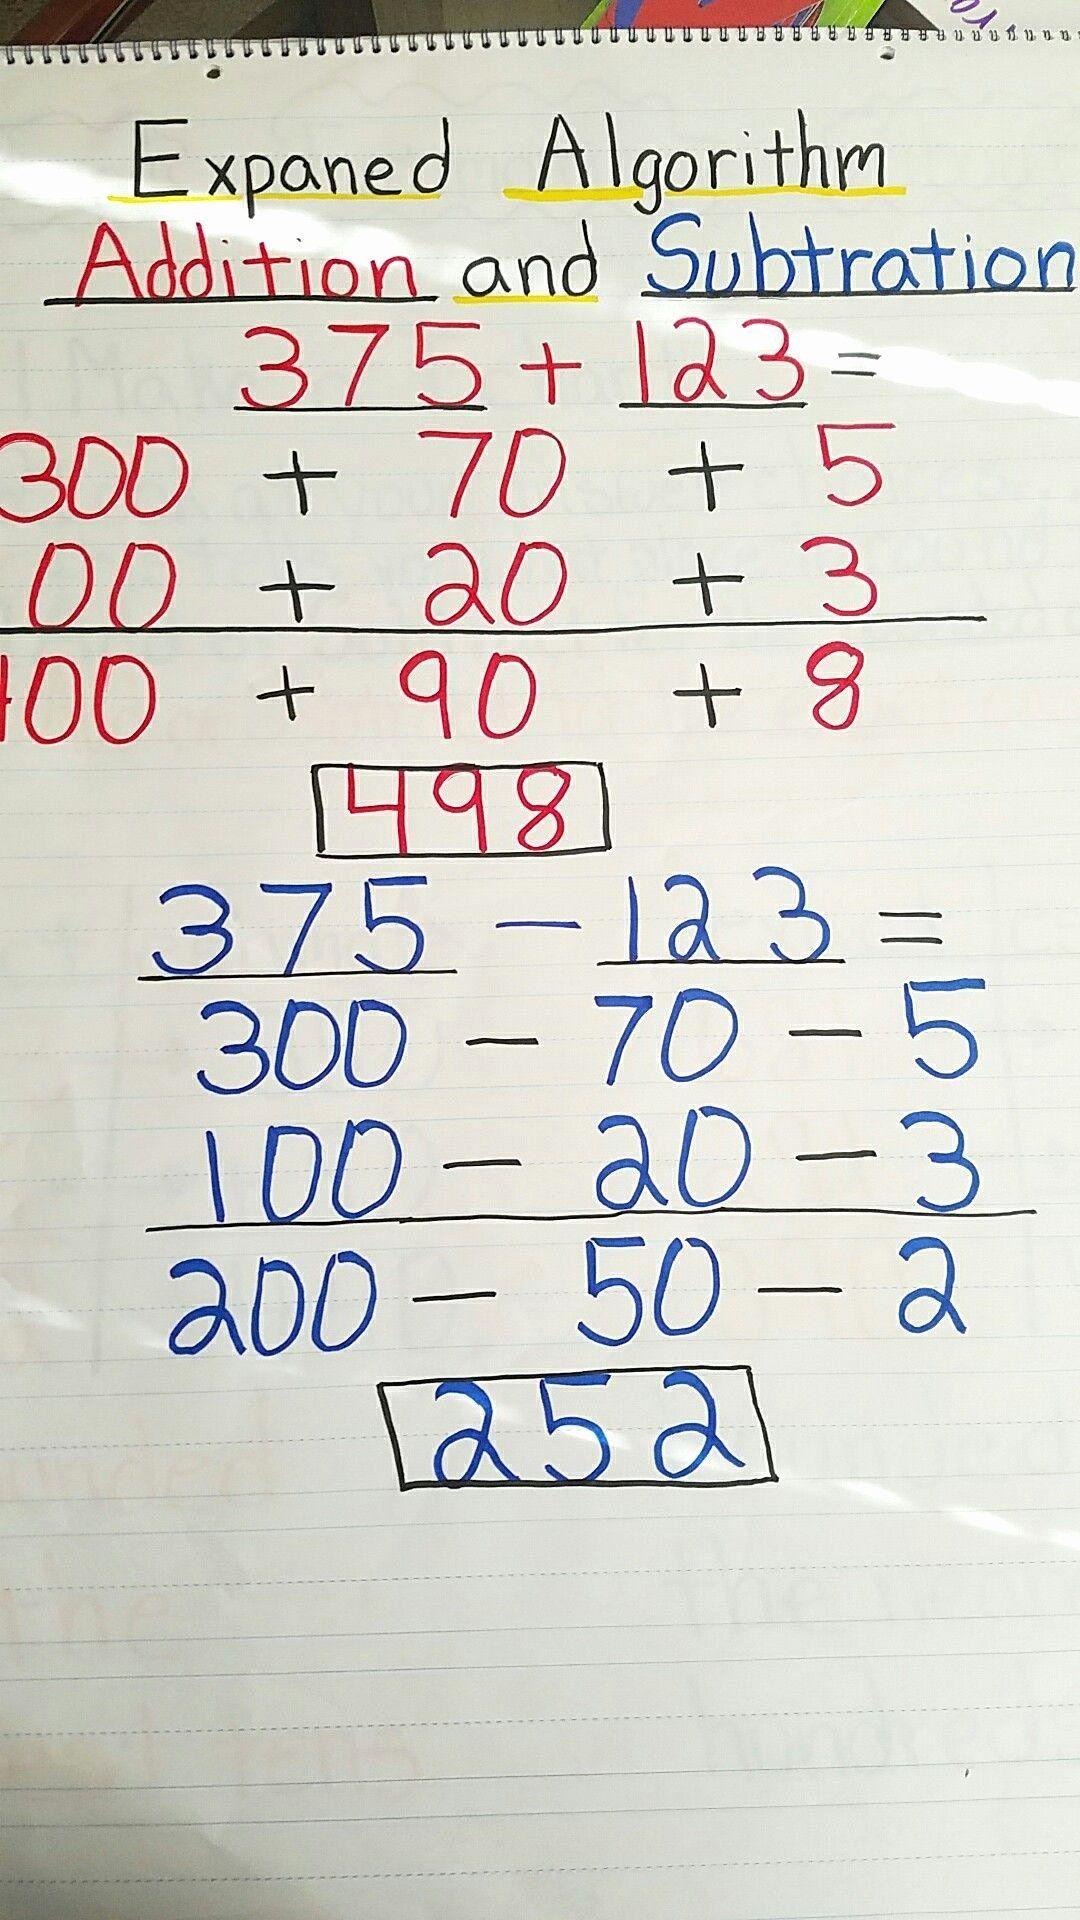 Expanded Algorithm Multiplication Worksheets Best Of Expanded Algorithm Addition An Math Practice Worksheets Addition And Subtraction Printable Math Worksheets Addition using expanded algorithm